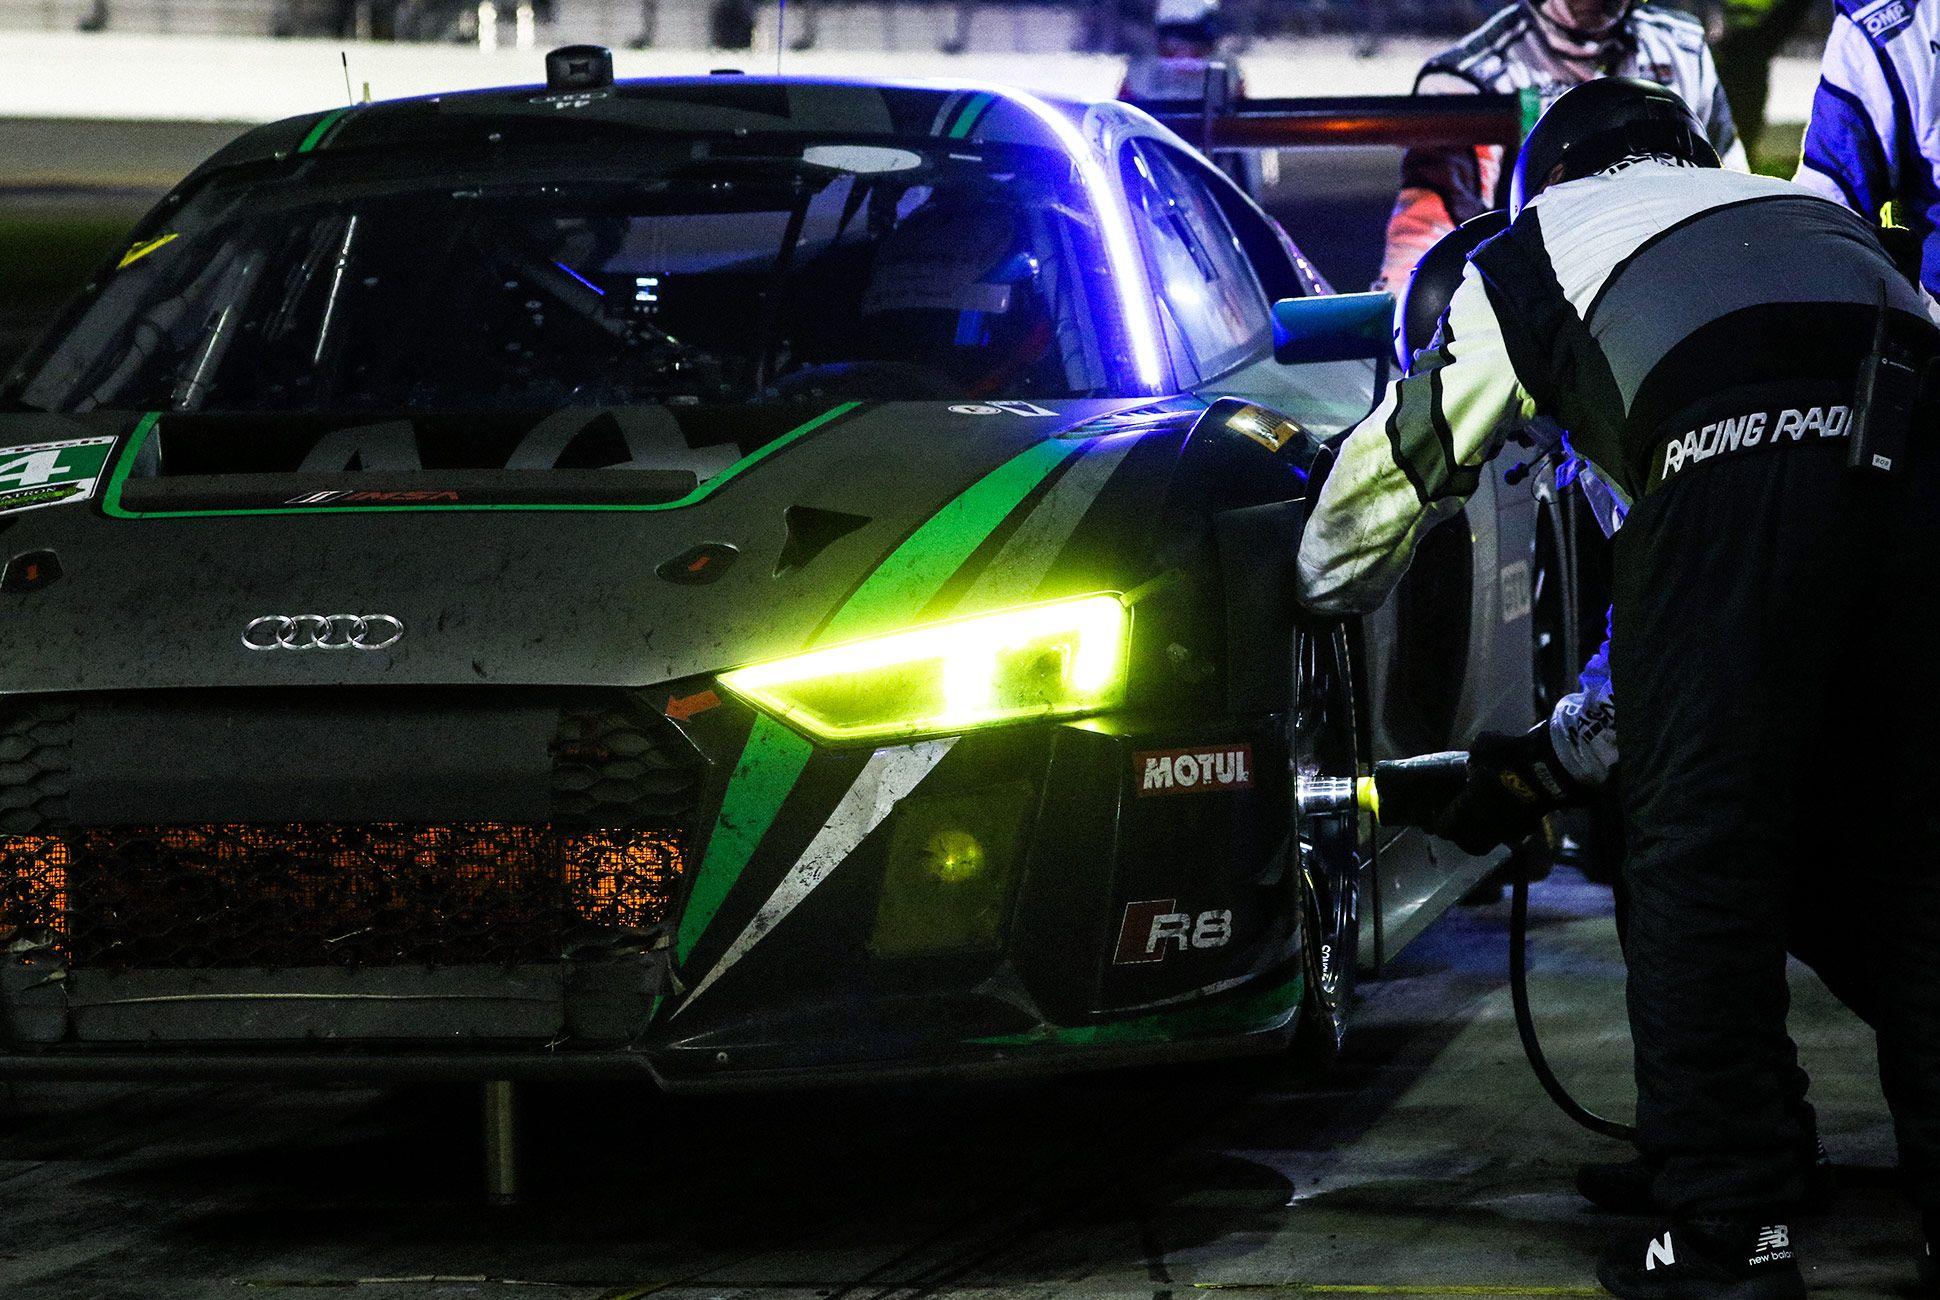 Best-Sports-Cars-of-2018-Daytona-24-Hours-gear-patrol-Audi-R8-LMS-1